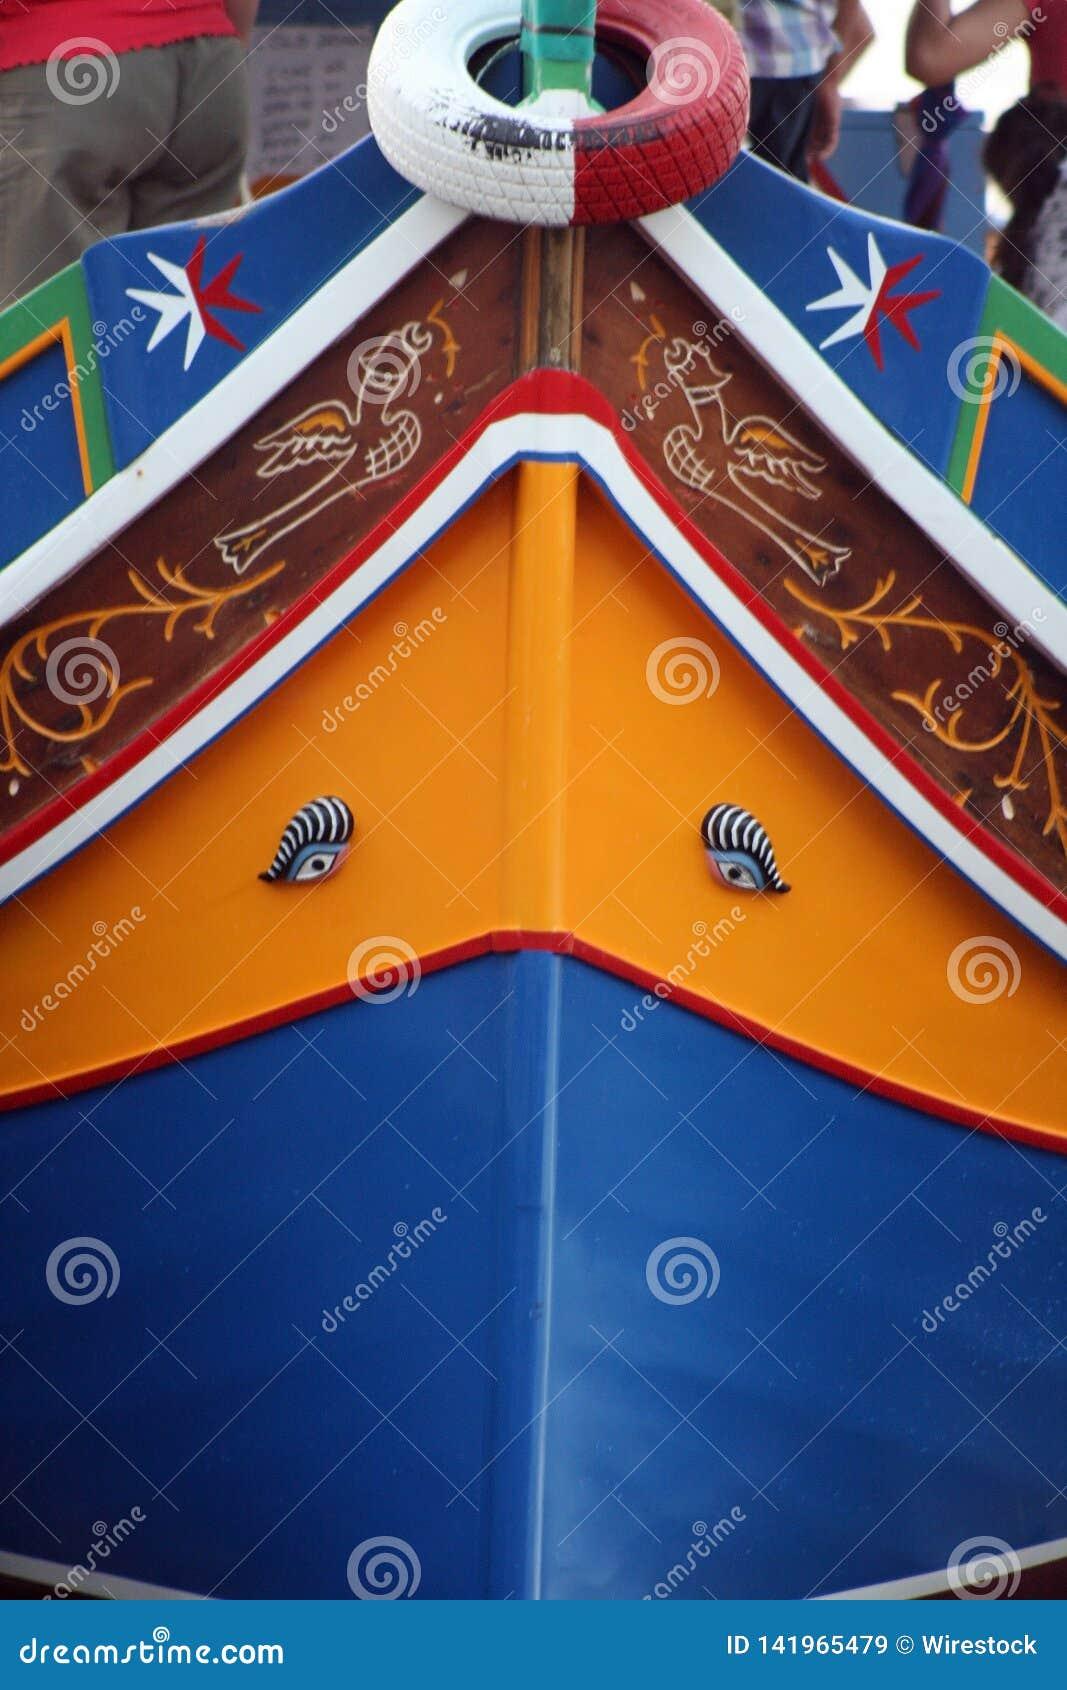 The Luzzu is a Maltese Boat